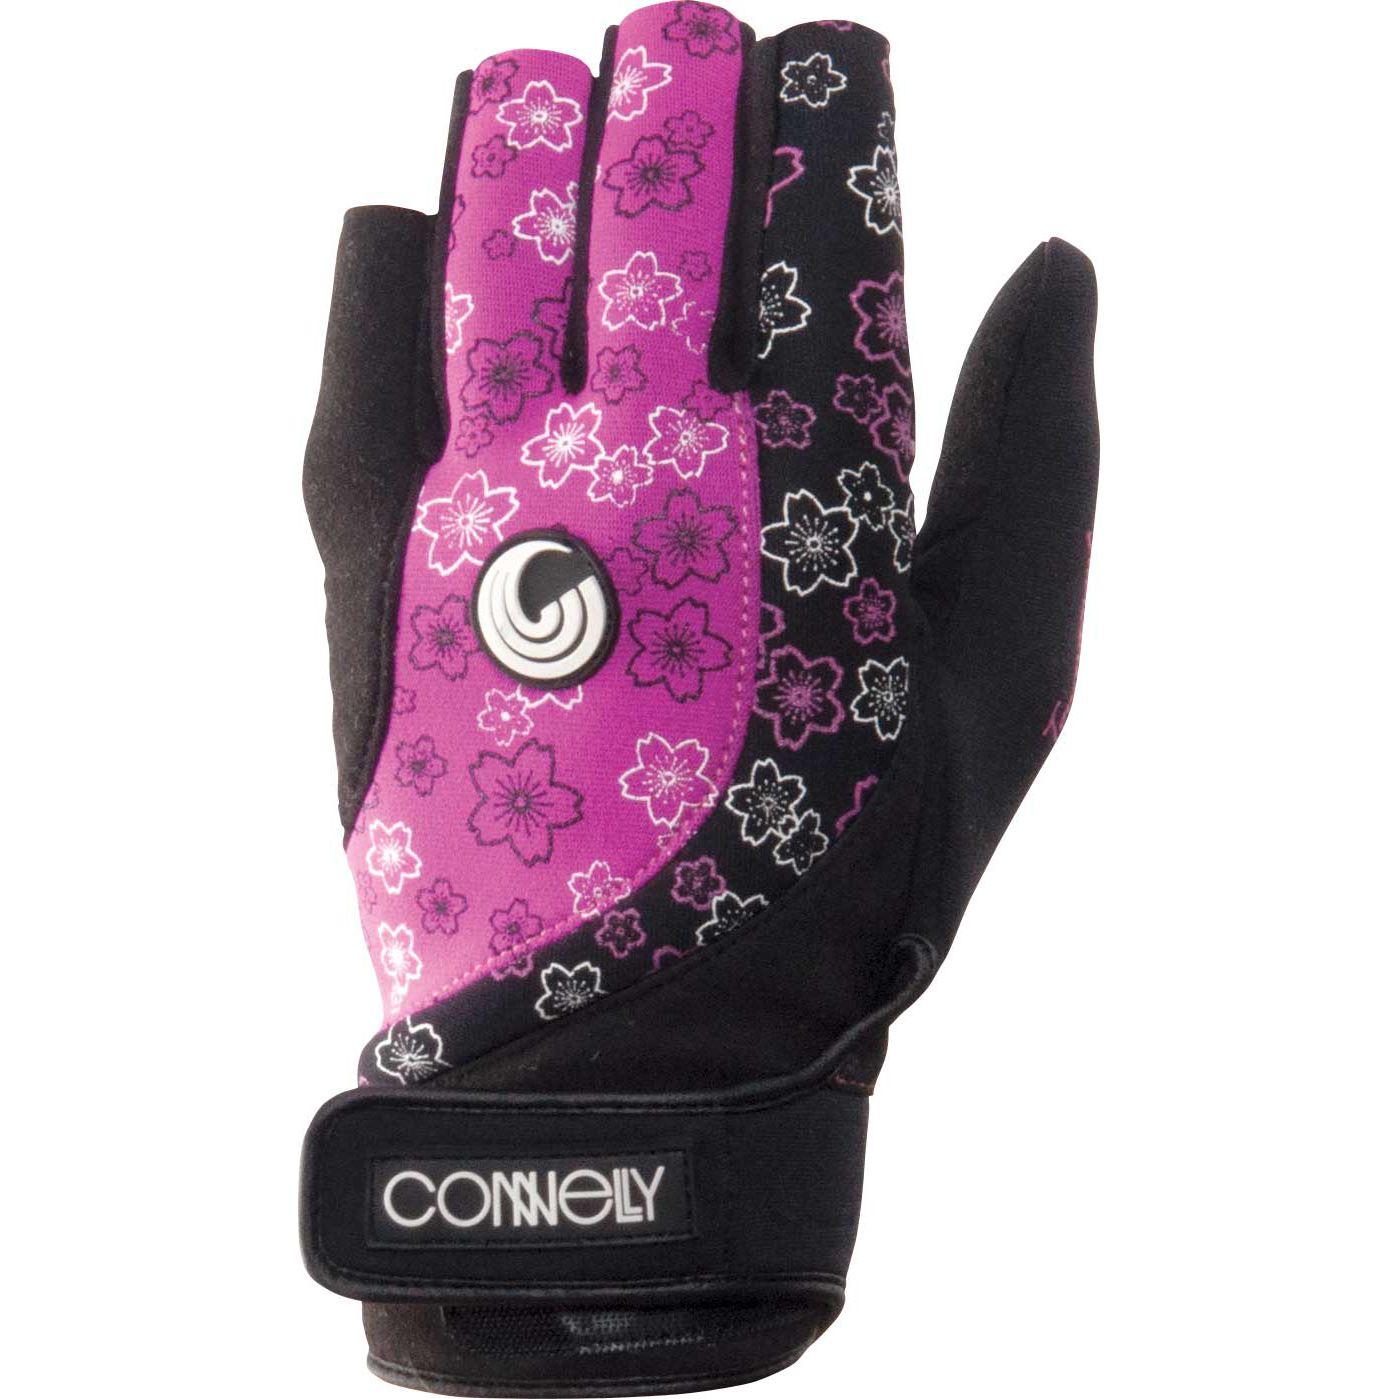 Connelly Women's Tournament Water Ski Gloves